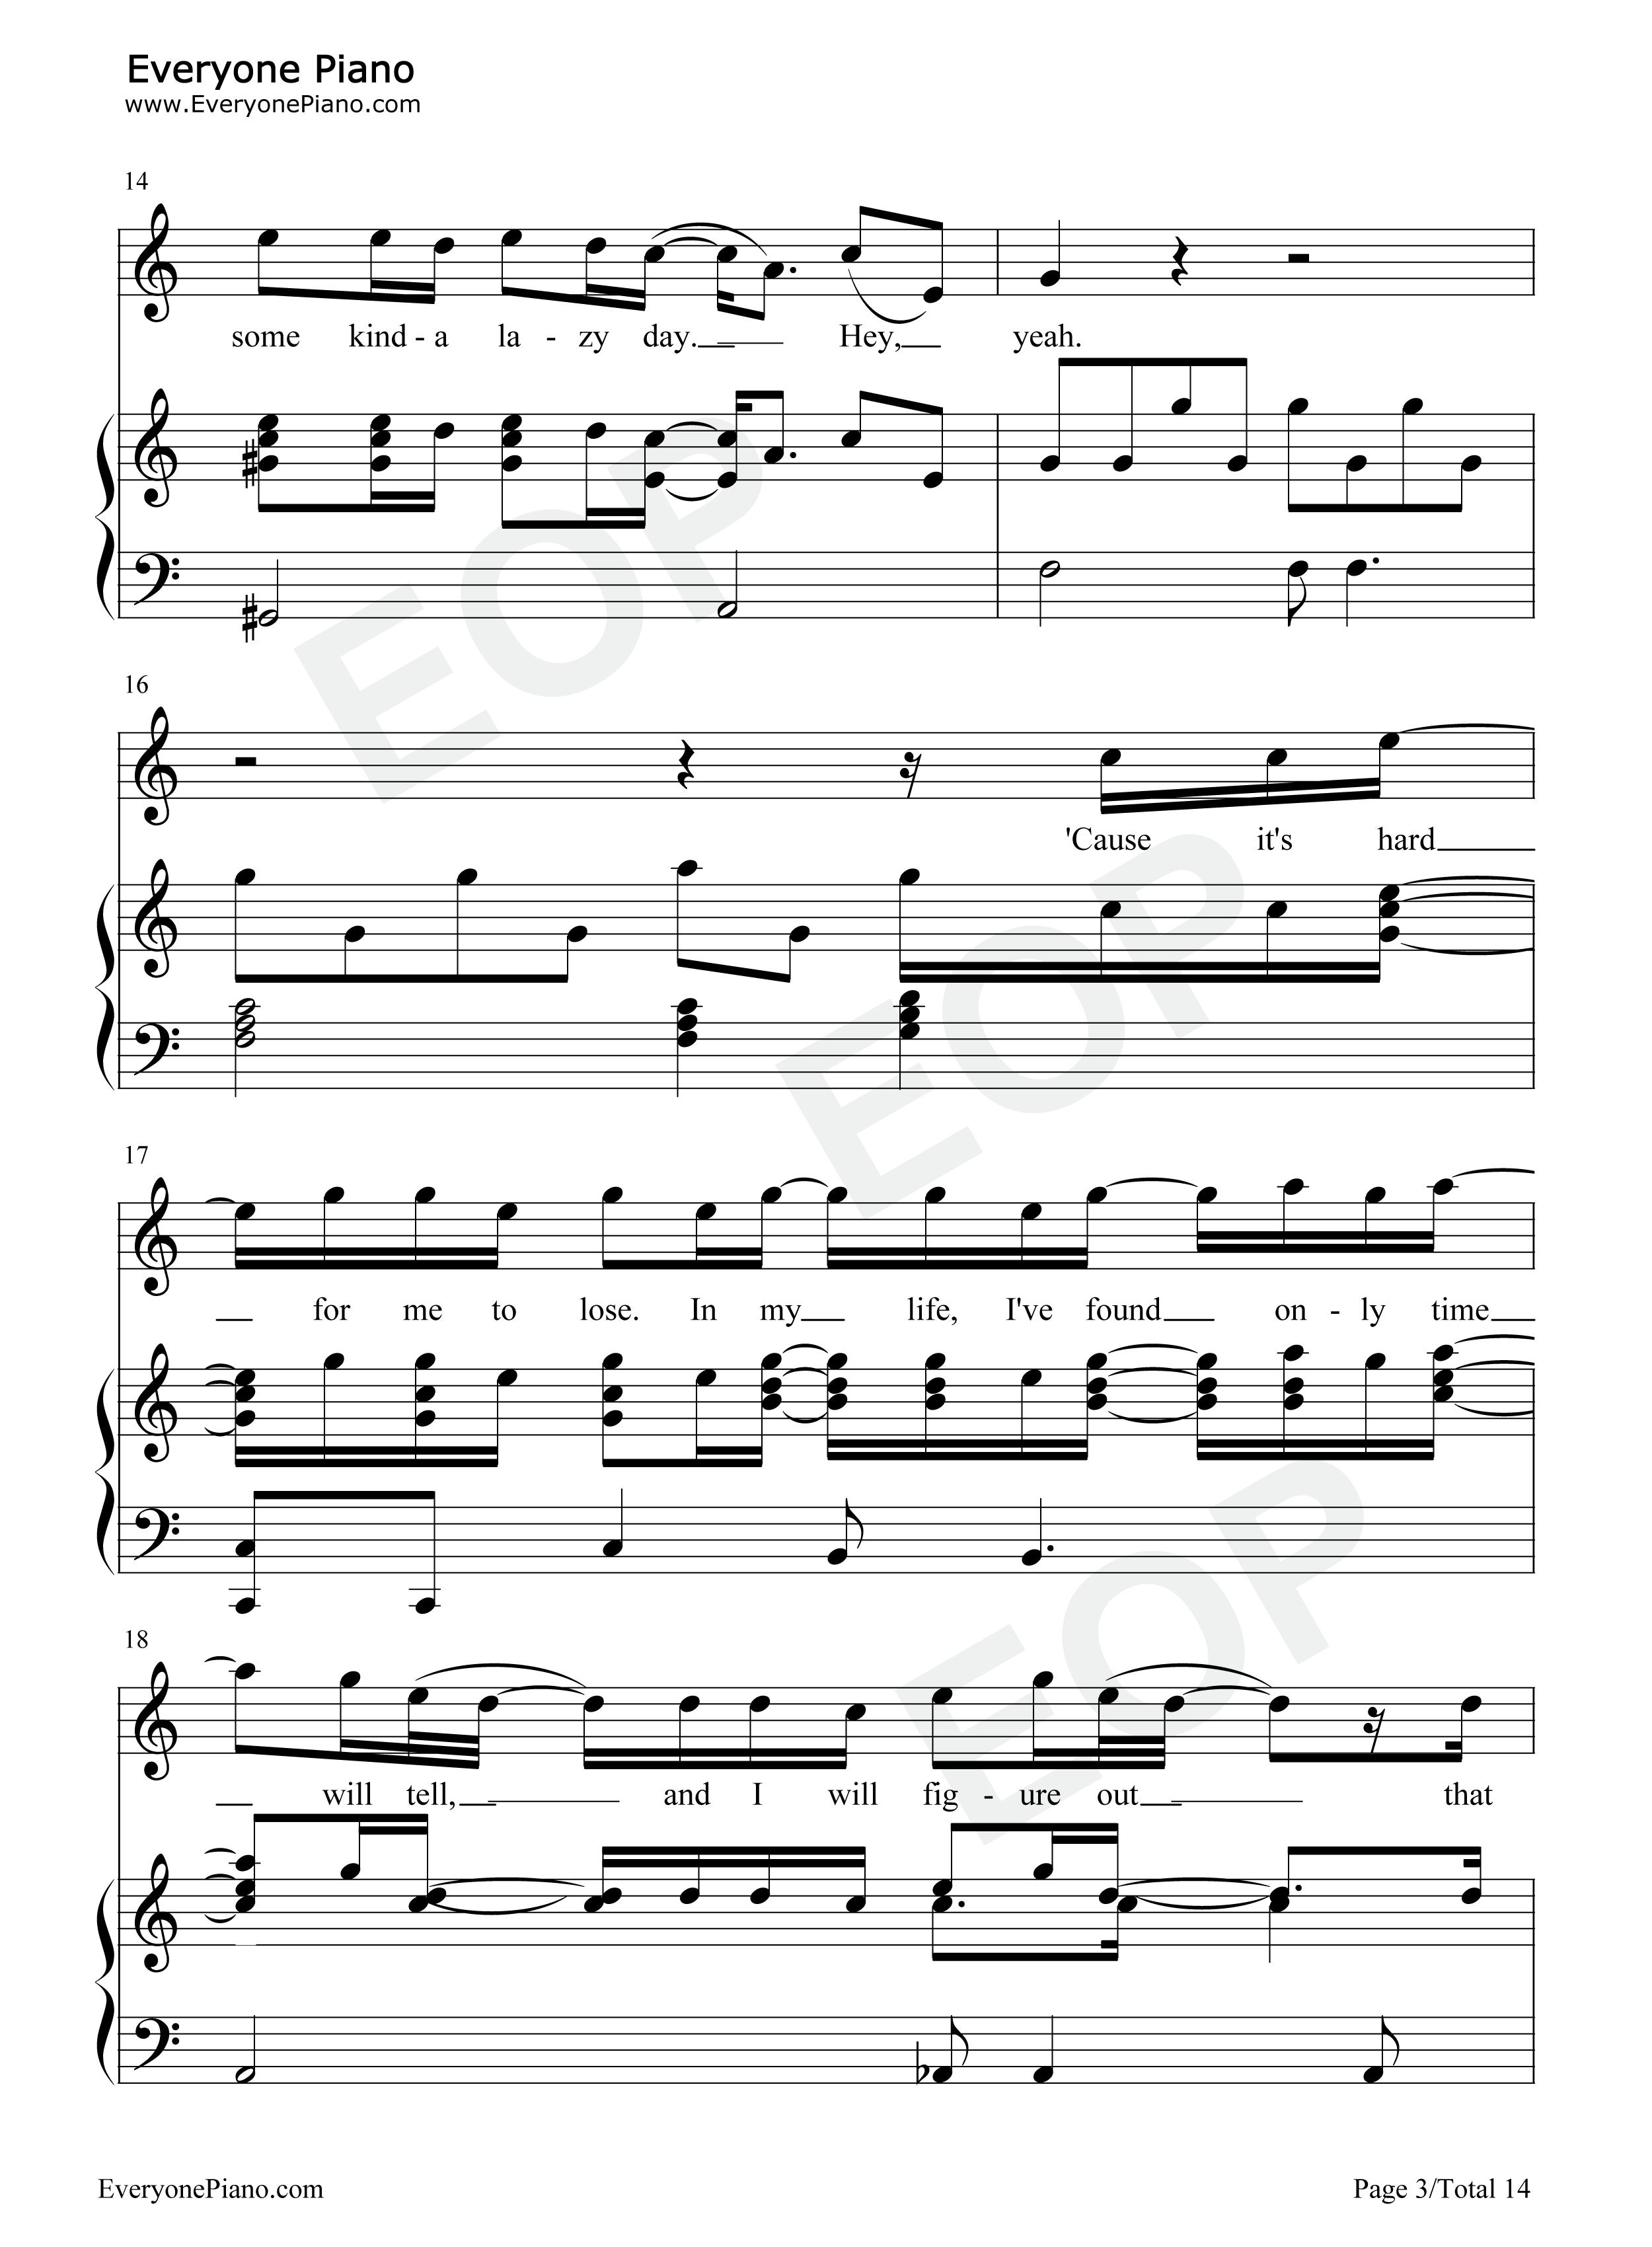 Free Loop-Daniel Richard Powter Stave Preview 3-Free Piano Sheet Music u0026 Piano Chords